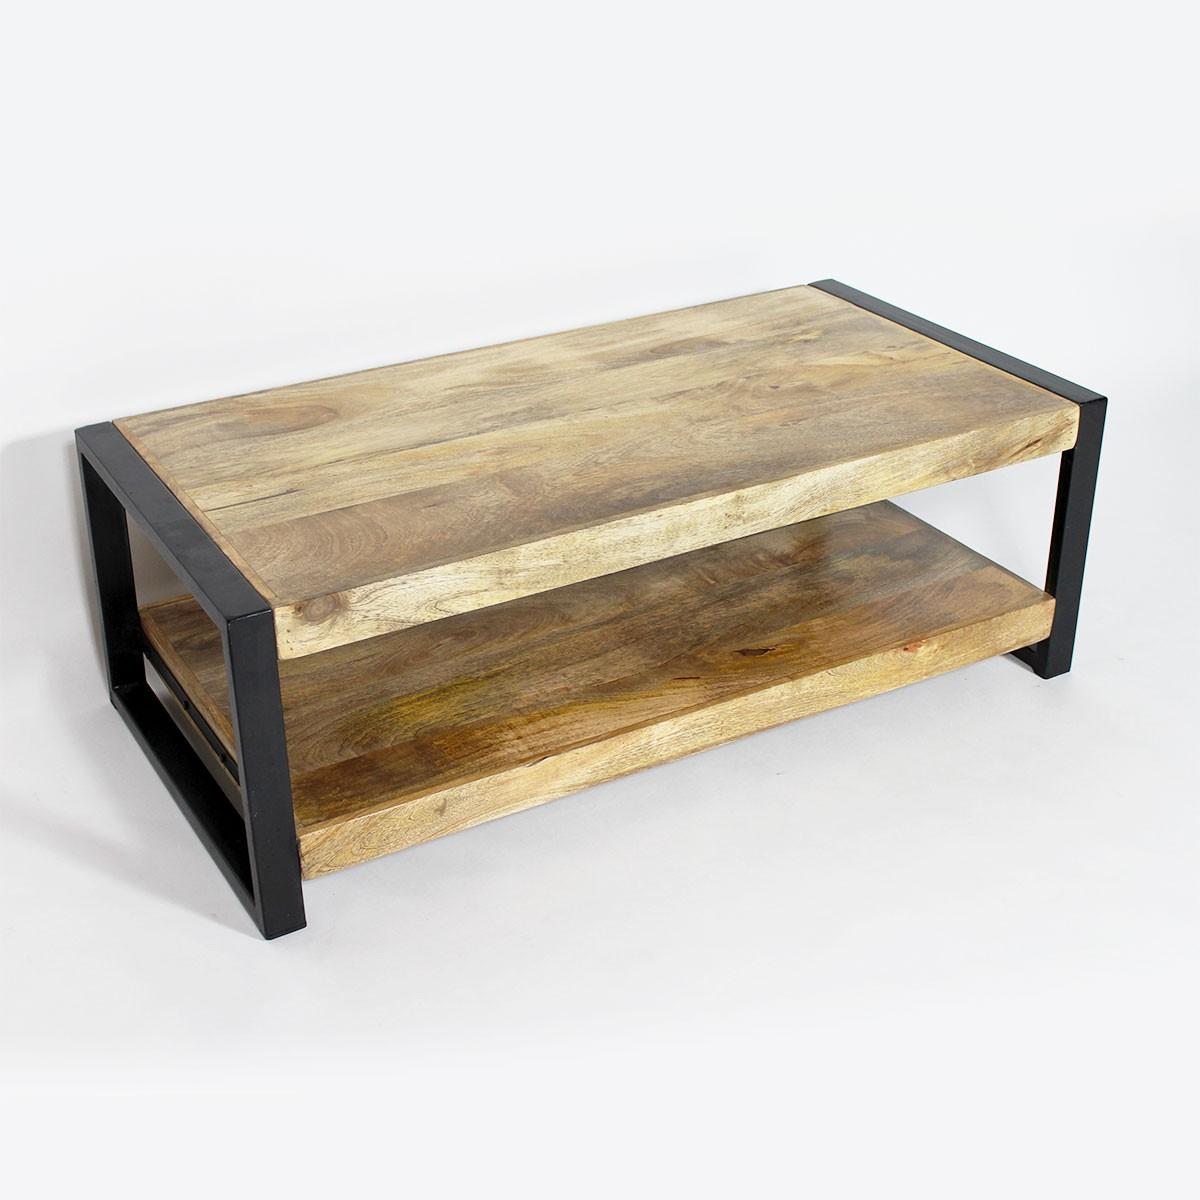 Table basse industrielle promo